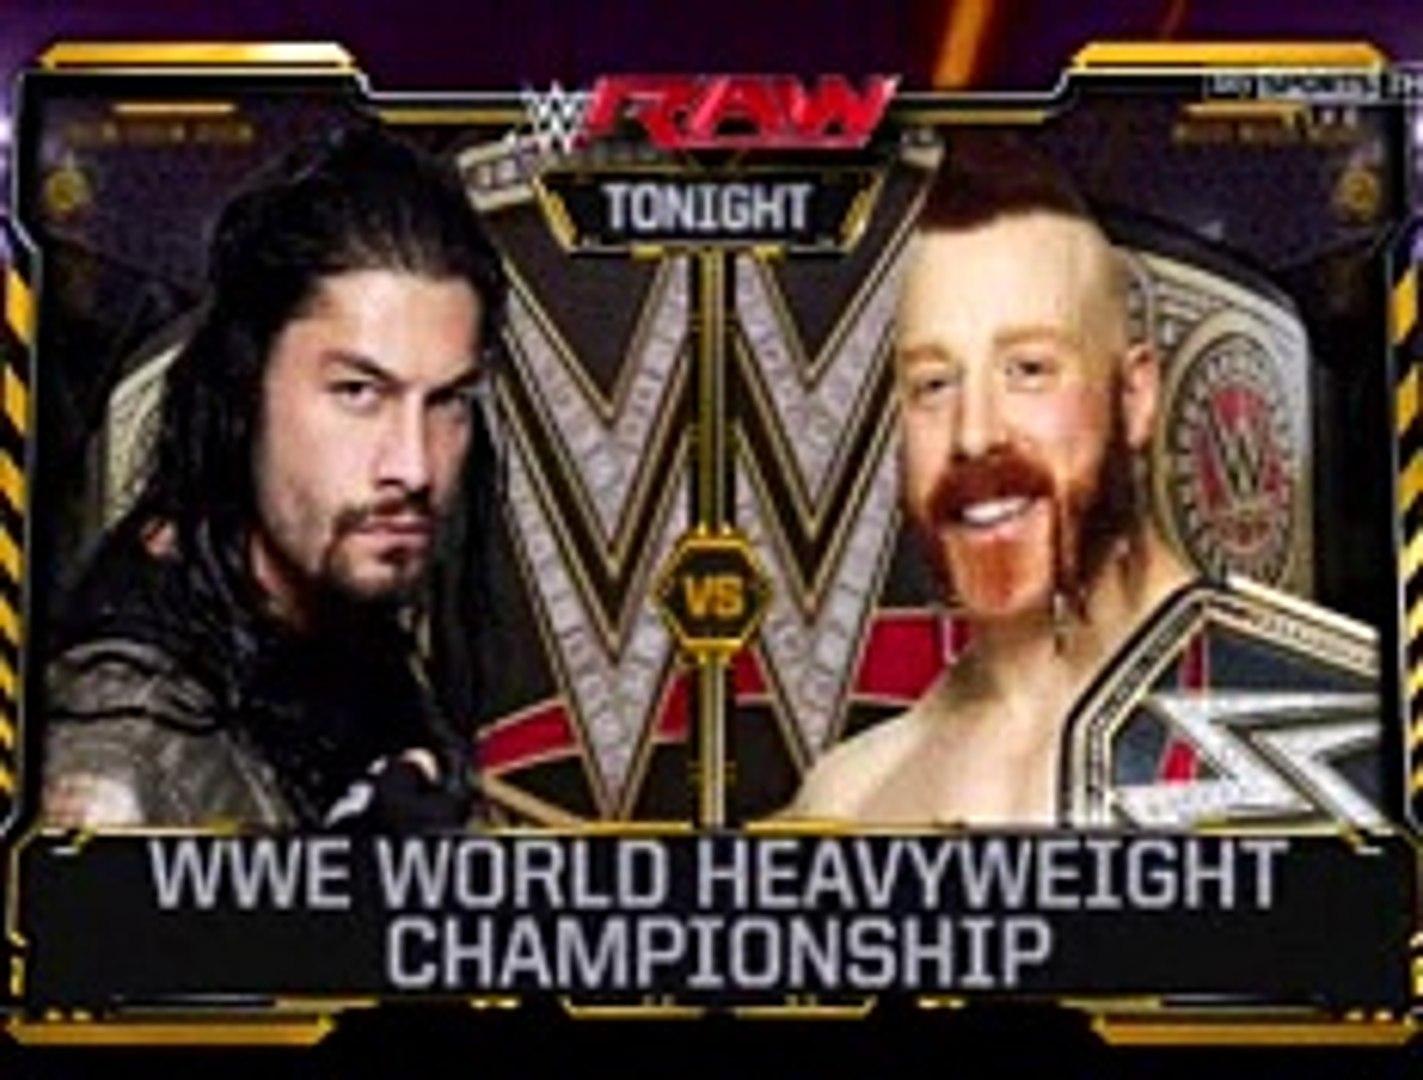 WWE Raw Full Show part 3 HDTV 14/12/15 14th December 2015 - WWE Monday Night Raw 14/12/15 Full Show